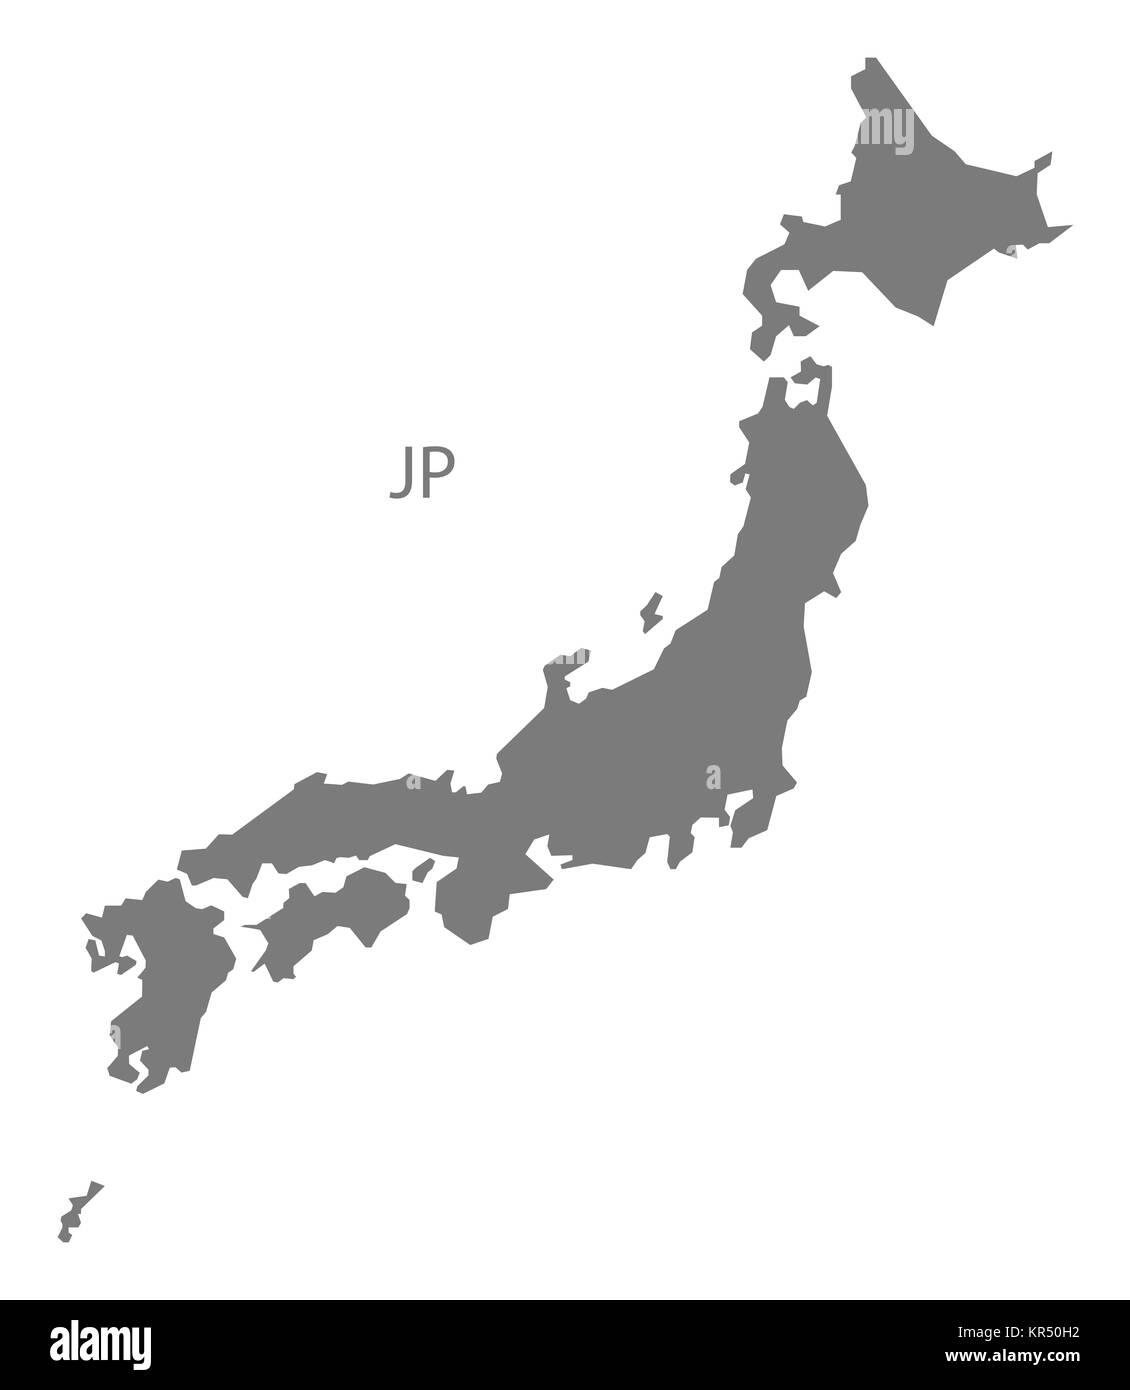 World Map Illustration Japan Stockfotos & World Map ...